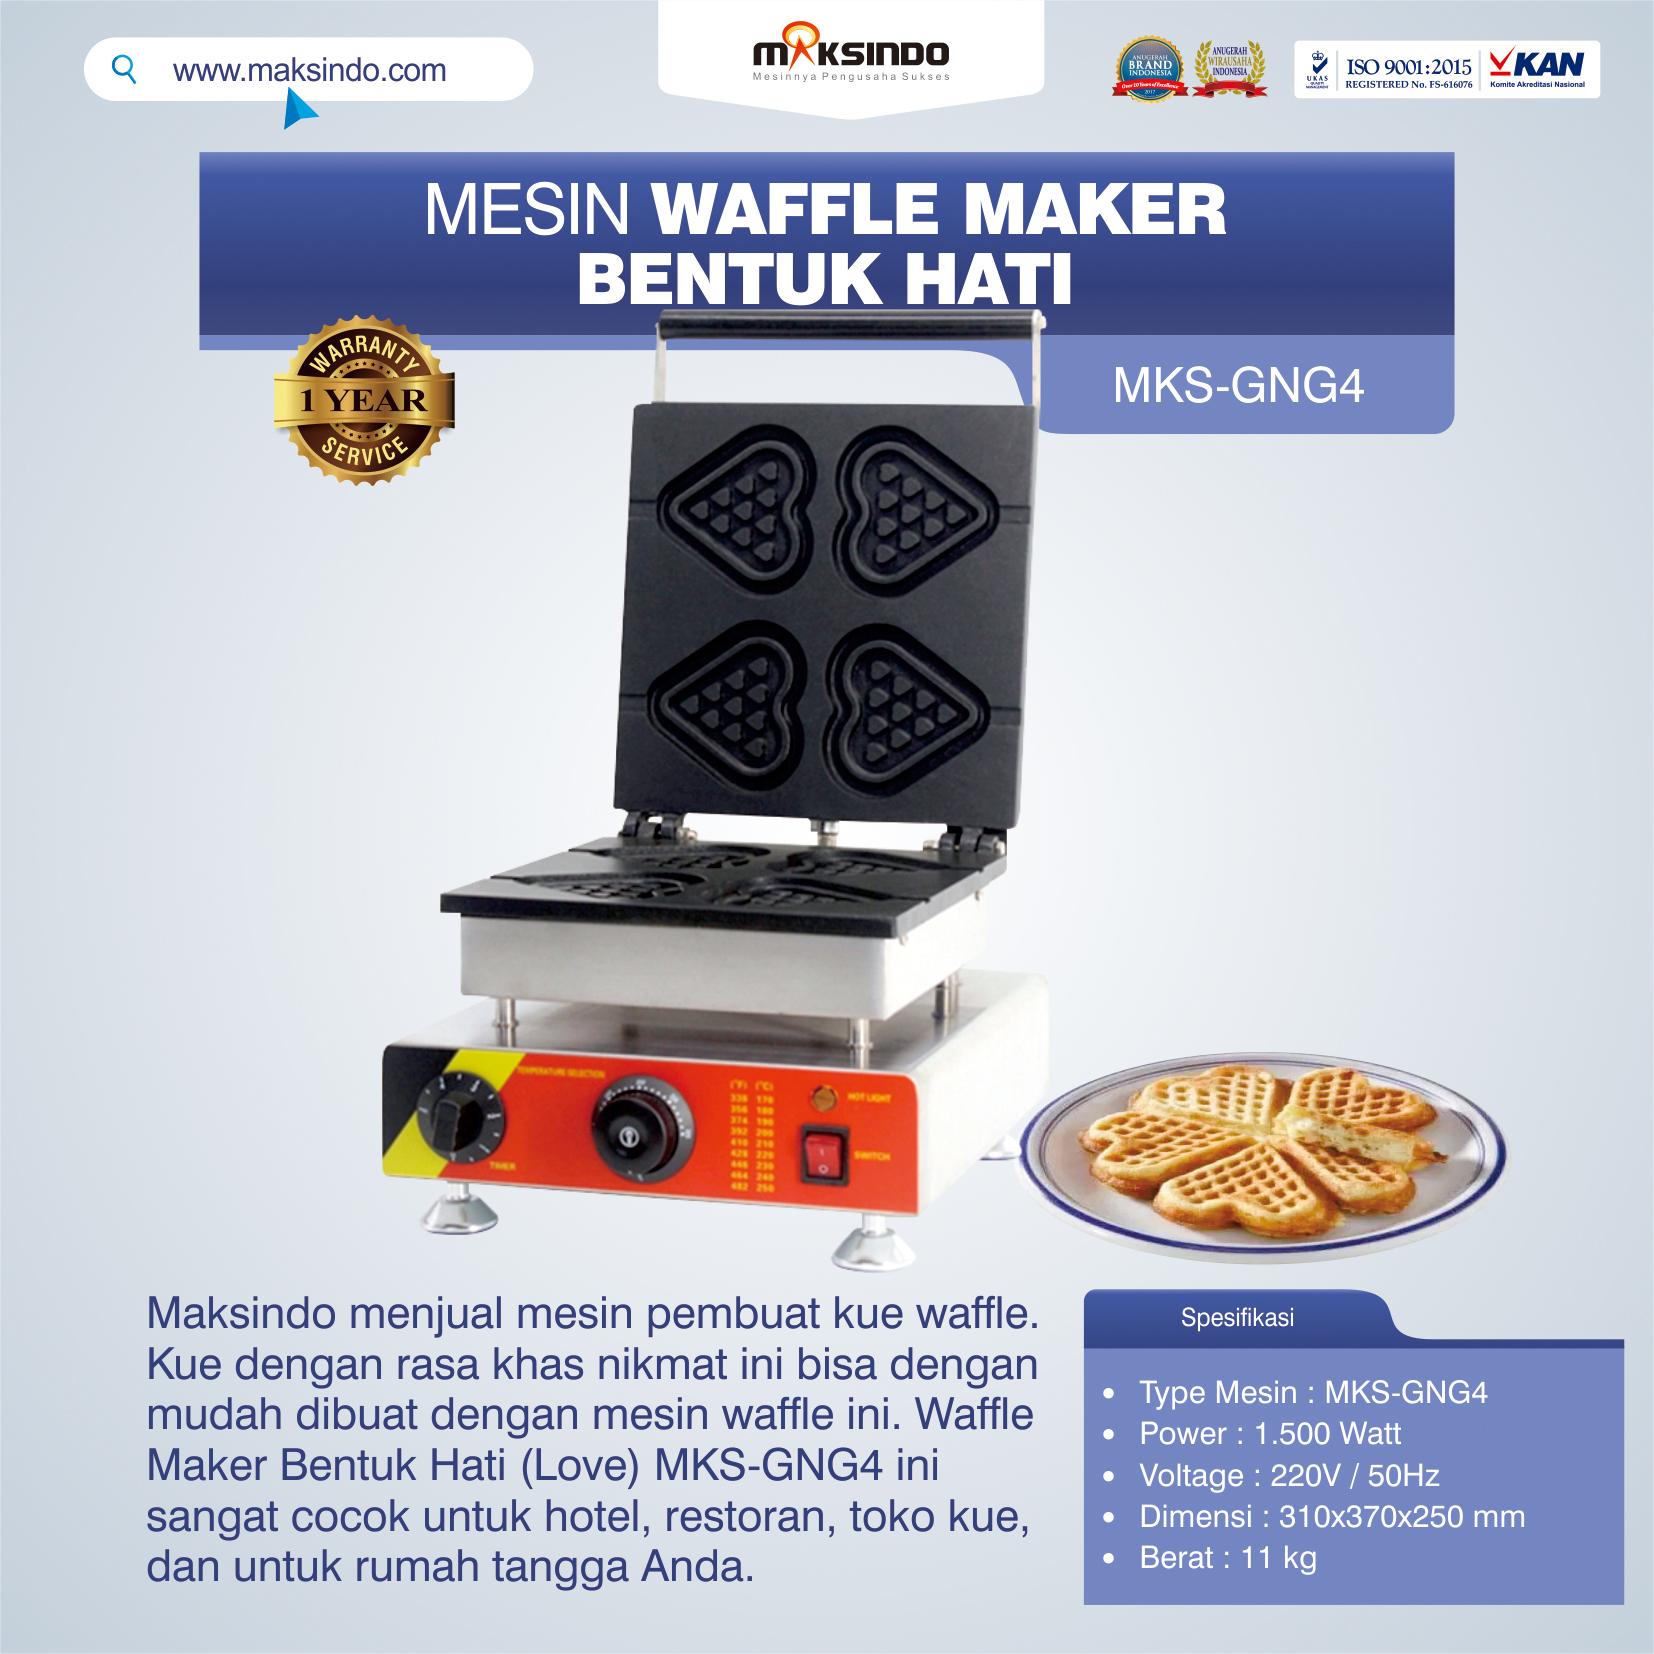 Jual Mesin Waffle Maker Bentuk Hati (Love) MKS-GNG4 di Bekasi